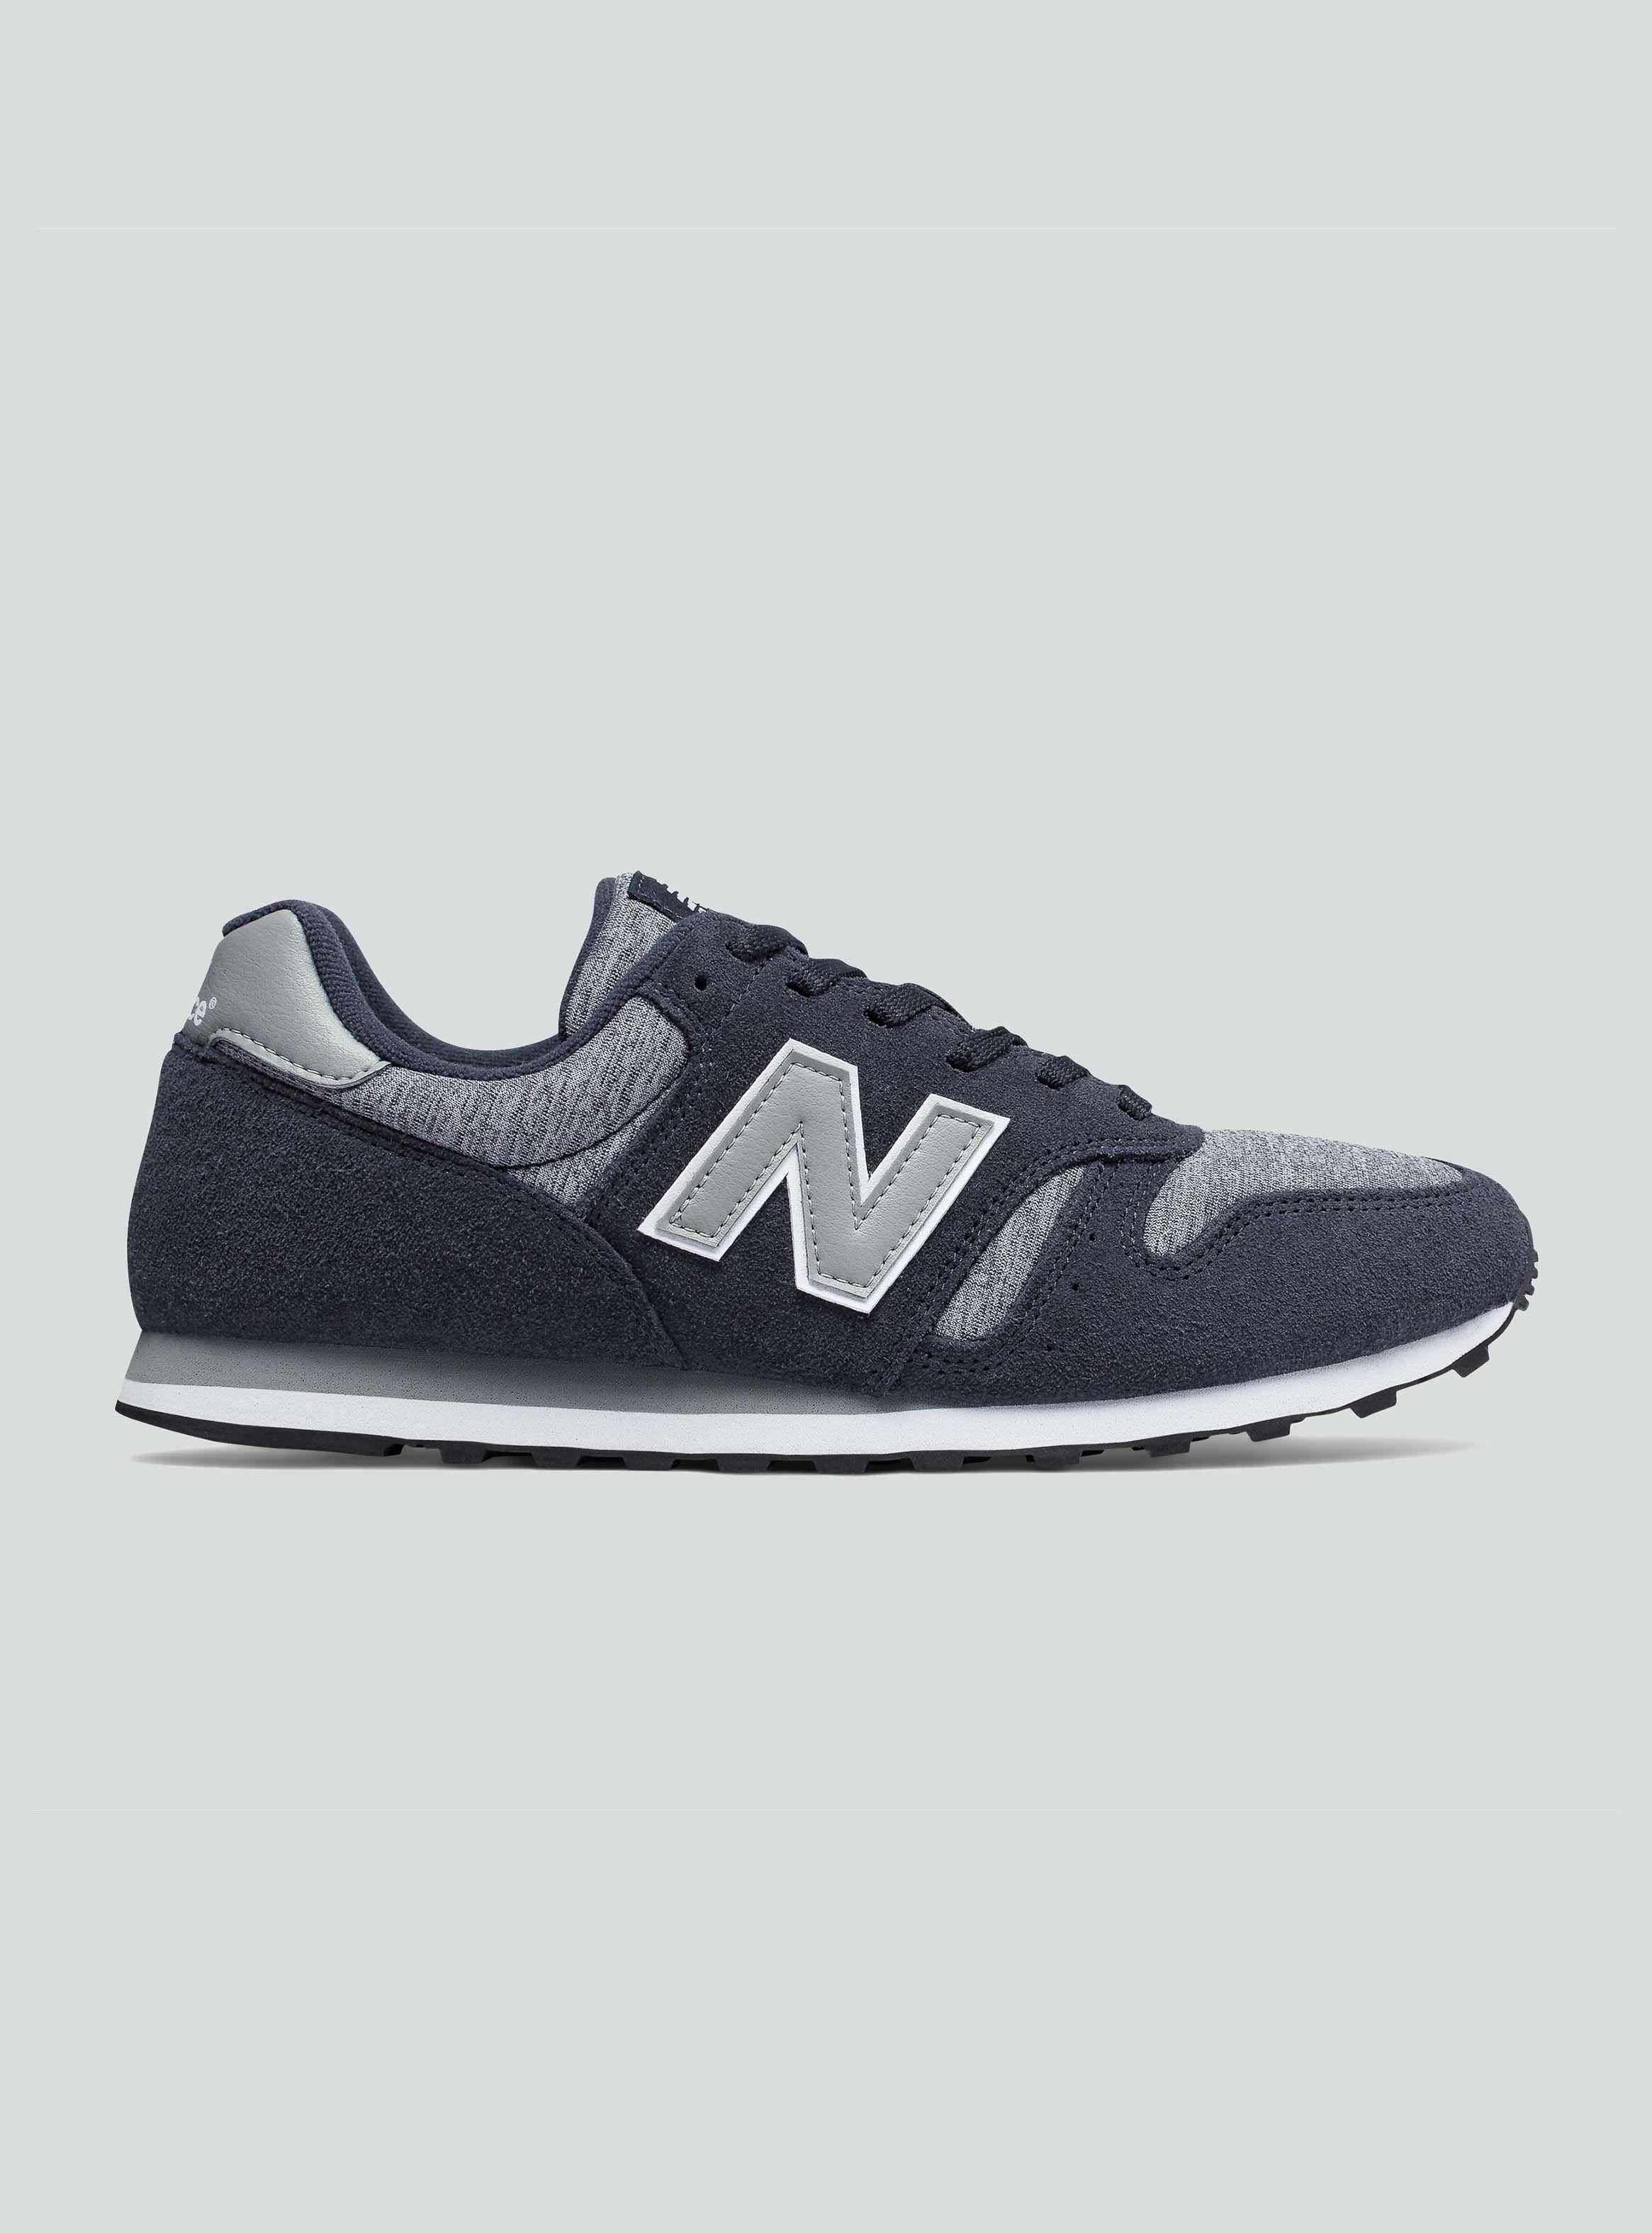 Capuchas Urbanas Hombres New Balance Zapatillas en Mercado